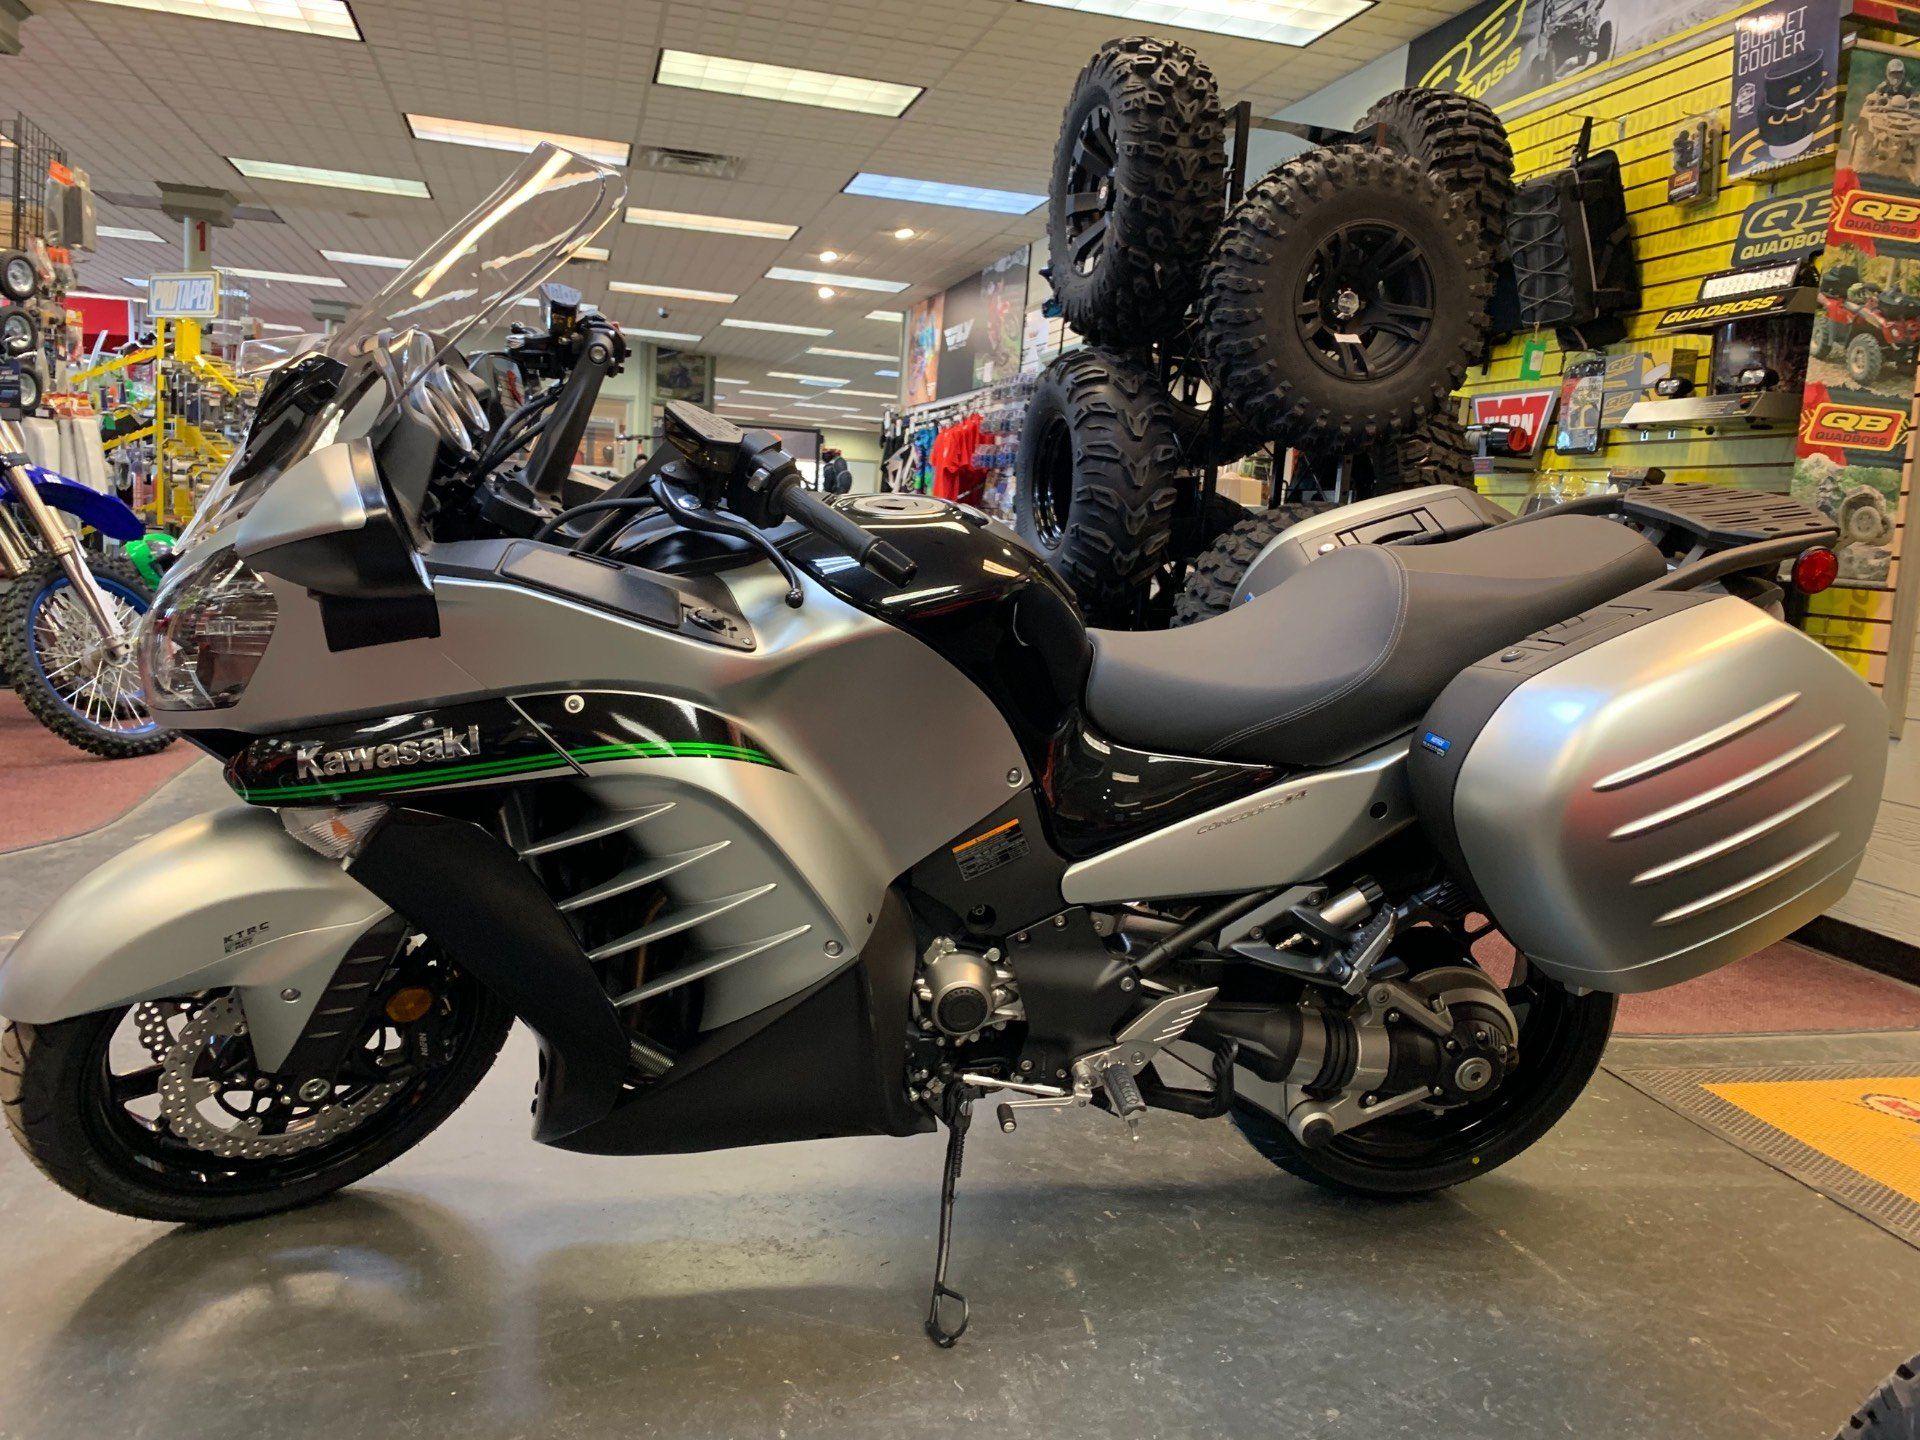 2019 Kawasaki Concours 14 ABS in Petersburg, West Virginia